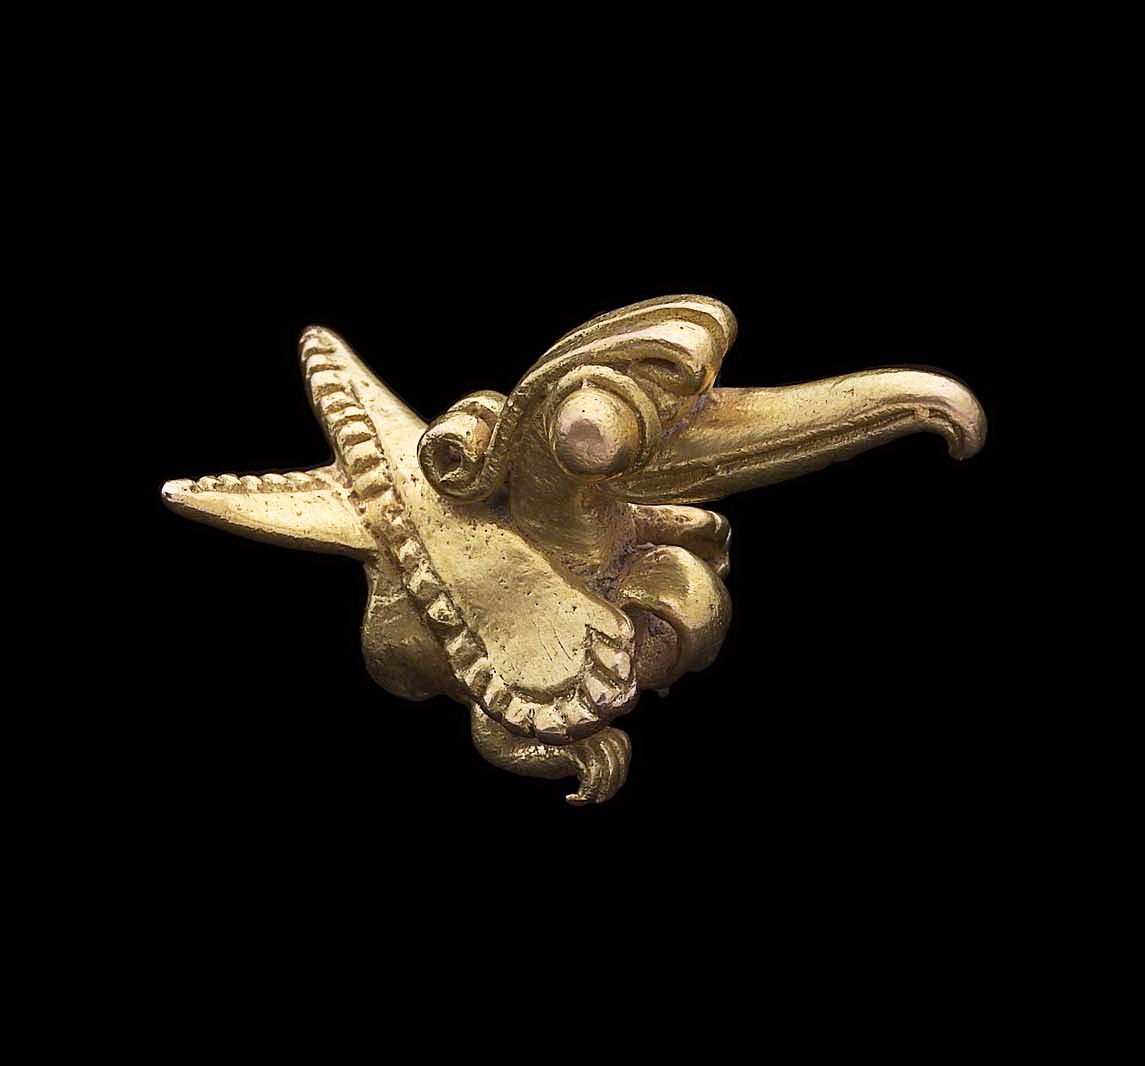 Avian effigy pendant Coclé, A.D. 700–1520 - Place of Origin, Sitio Conte area, Coclé Province, Panama